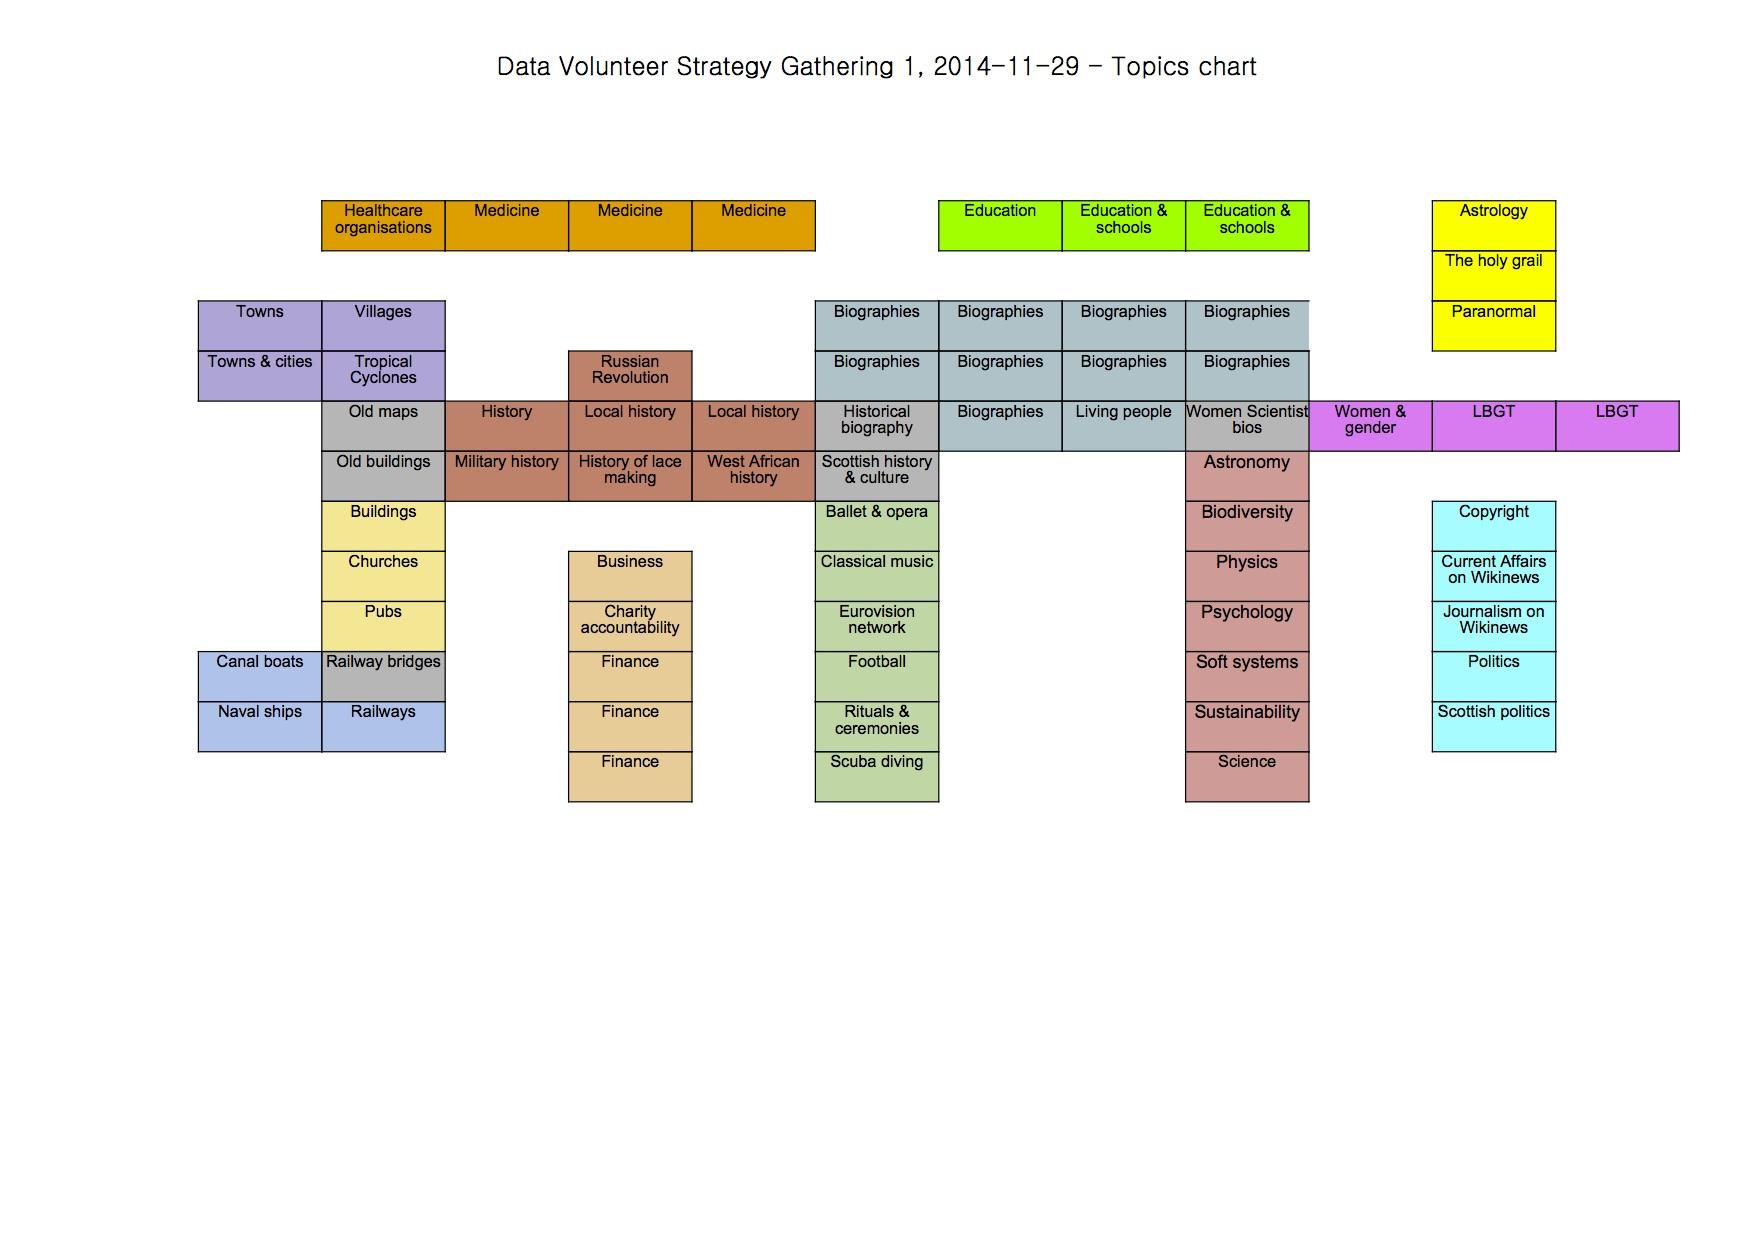 Gender Chart: Data Volunteer Strategy Gathering 1 2014-11-29 - Topics ,Chart